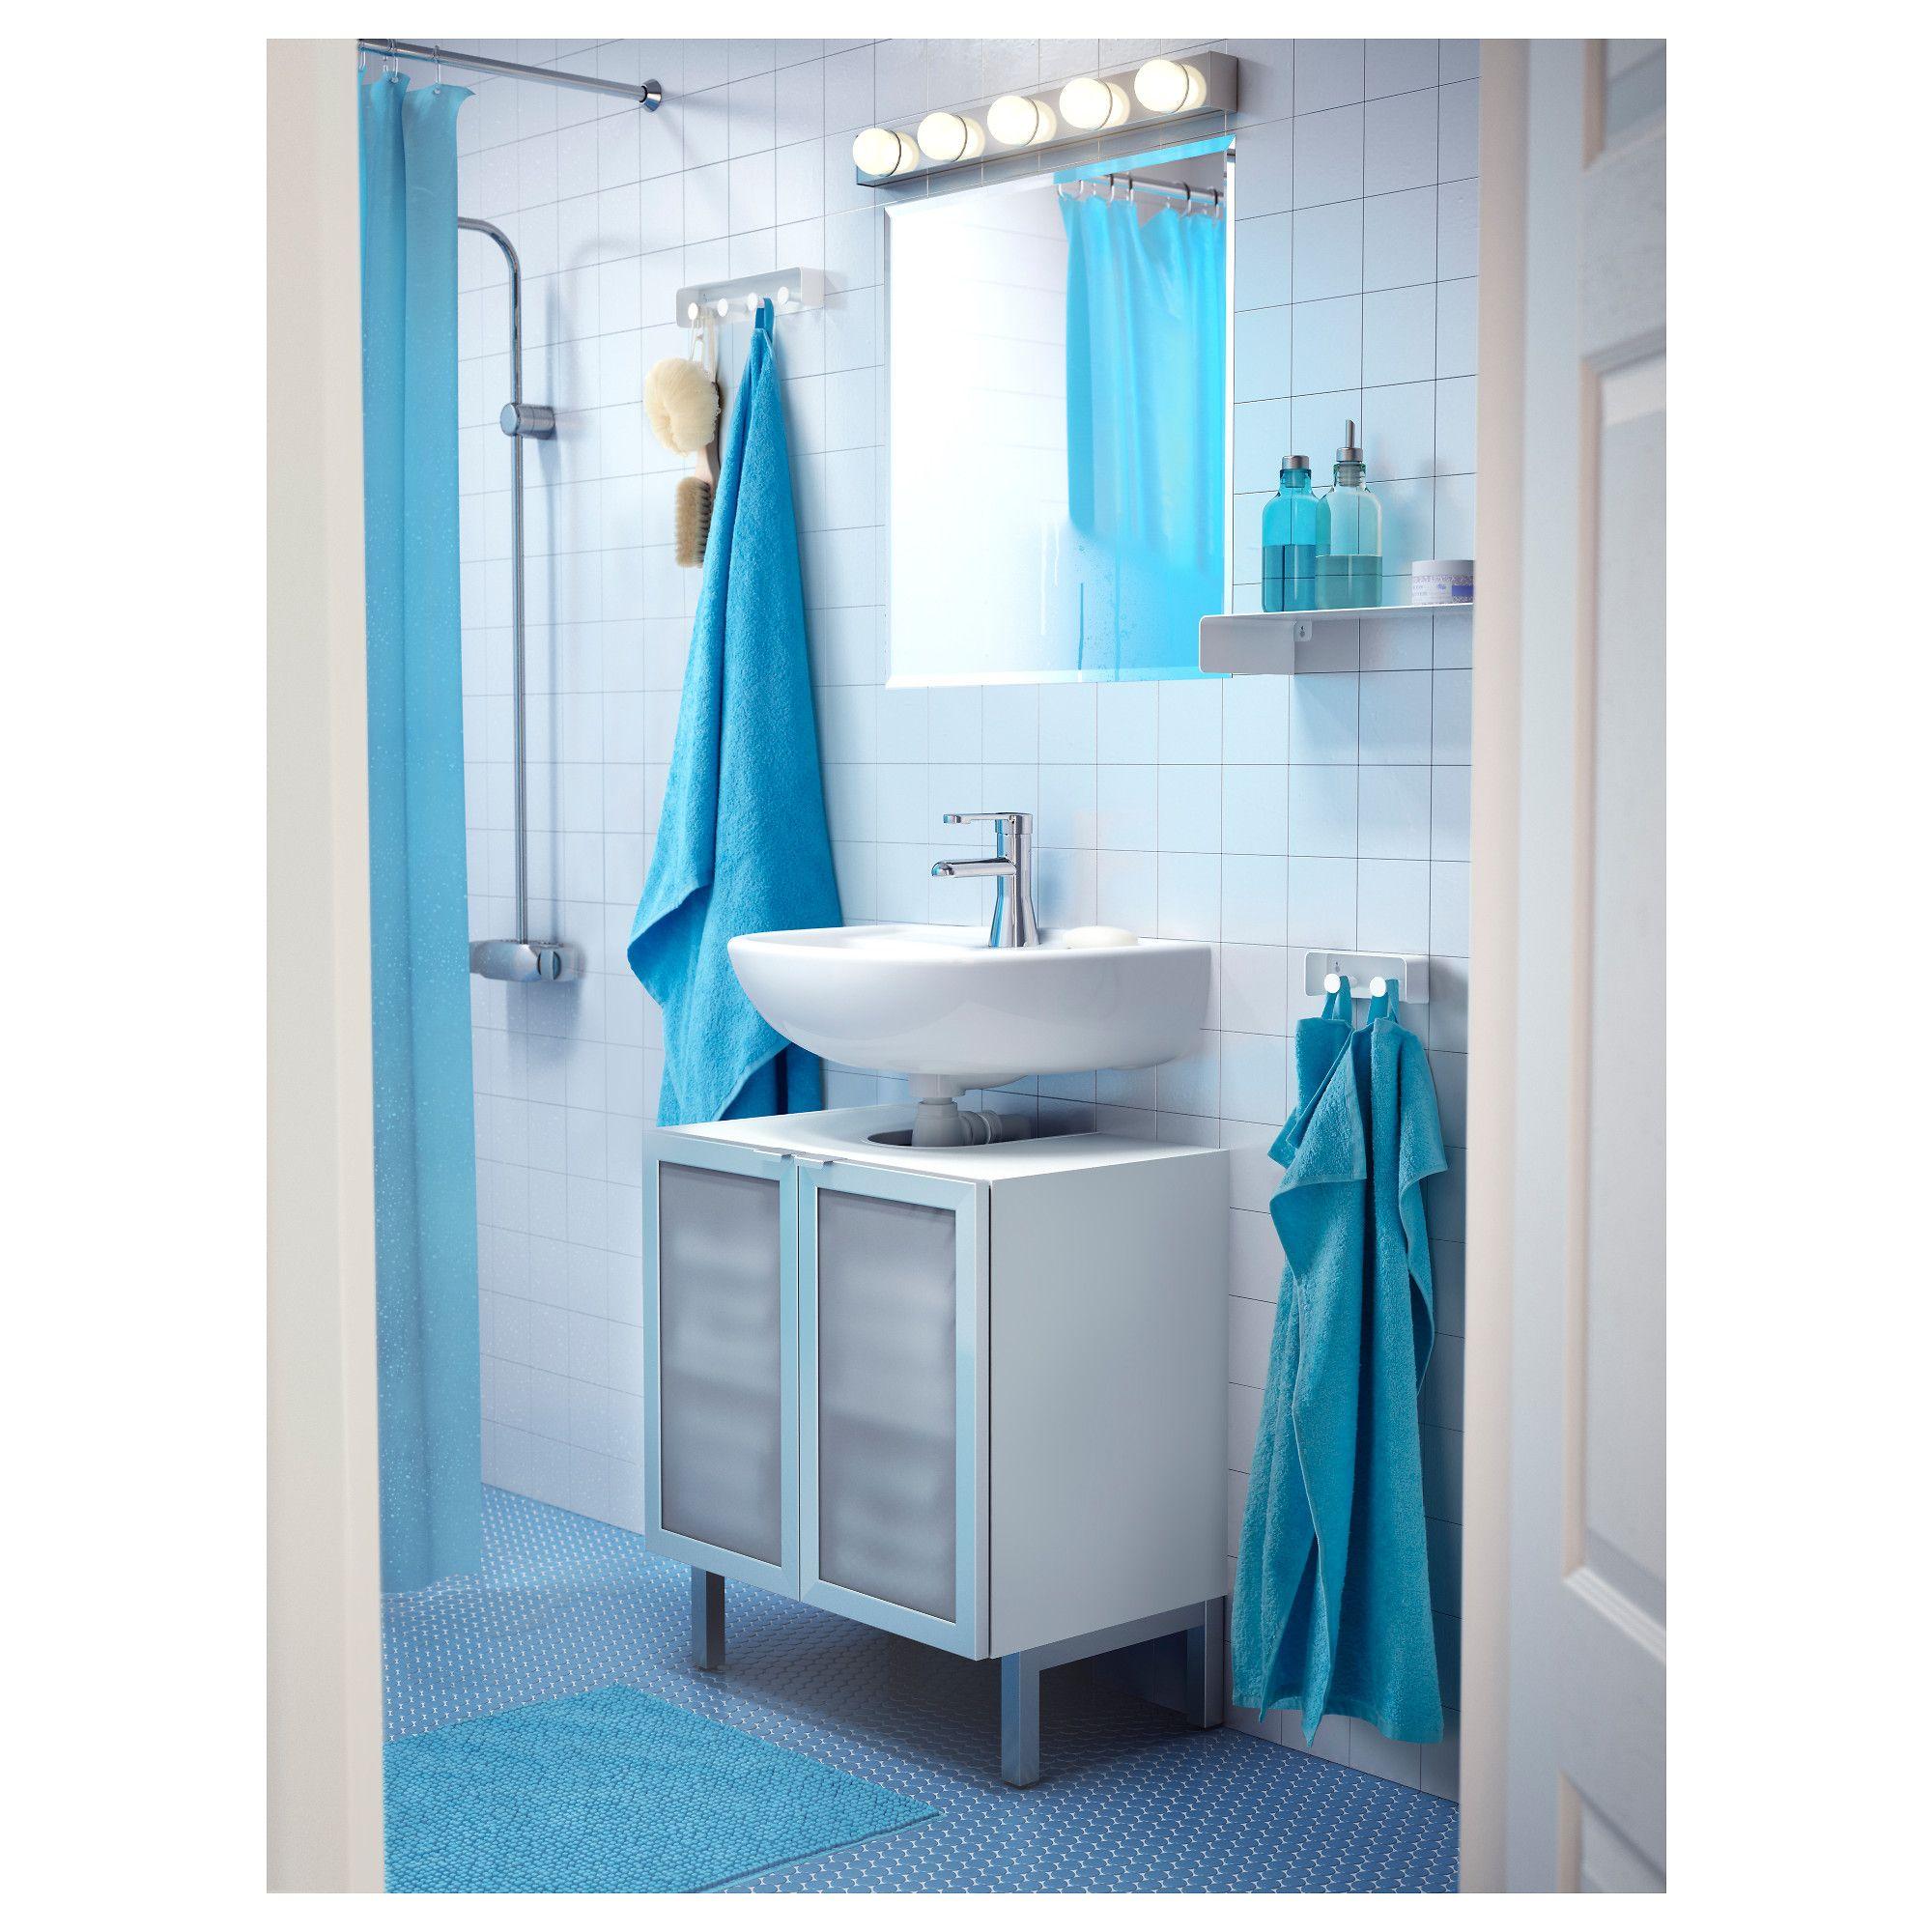 Towel Rack Enudden White In